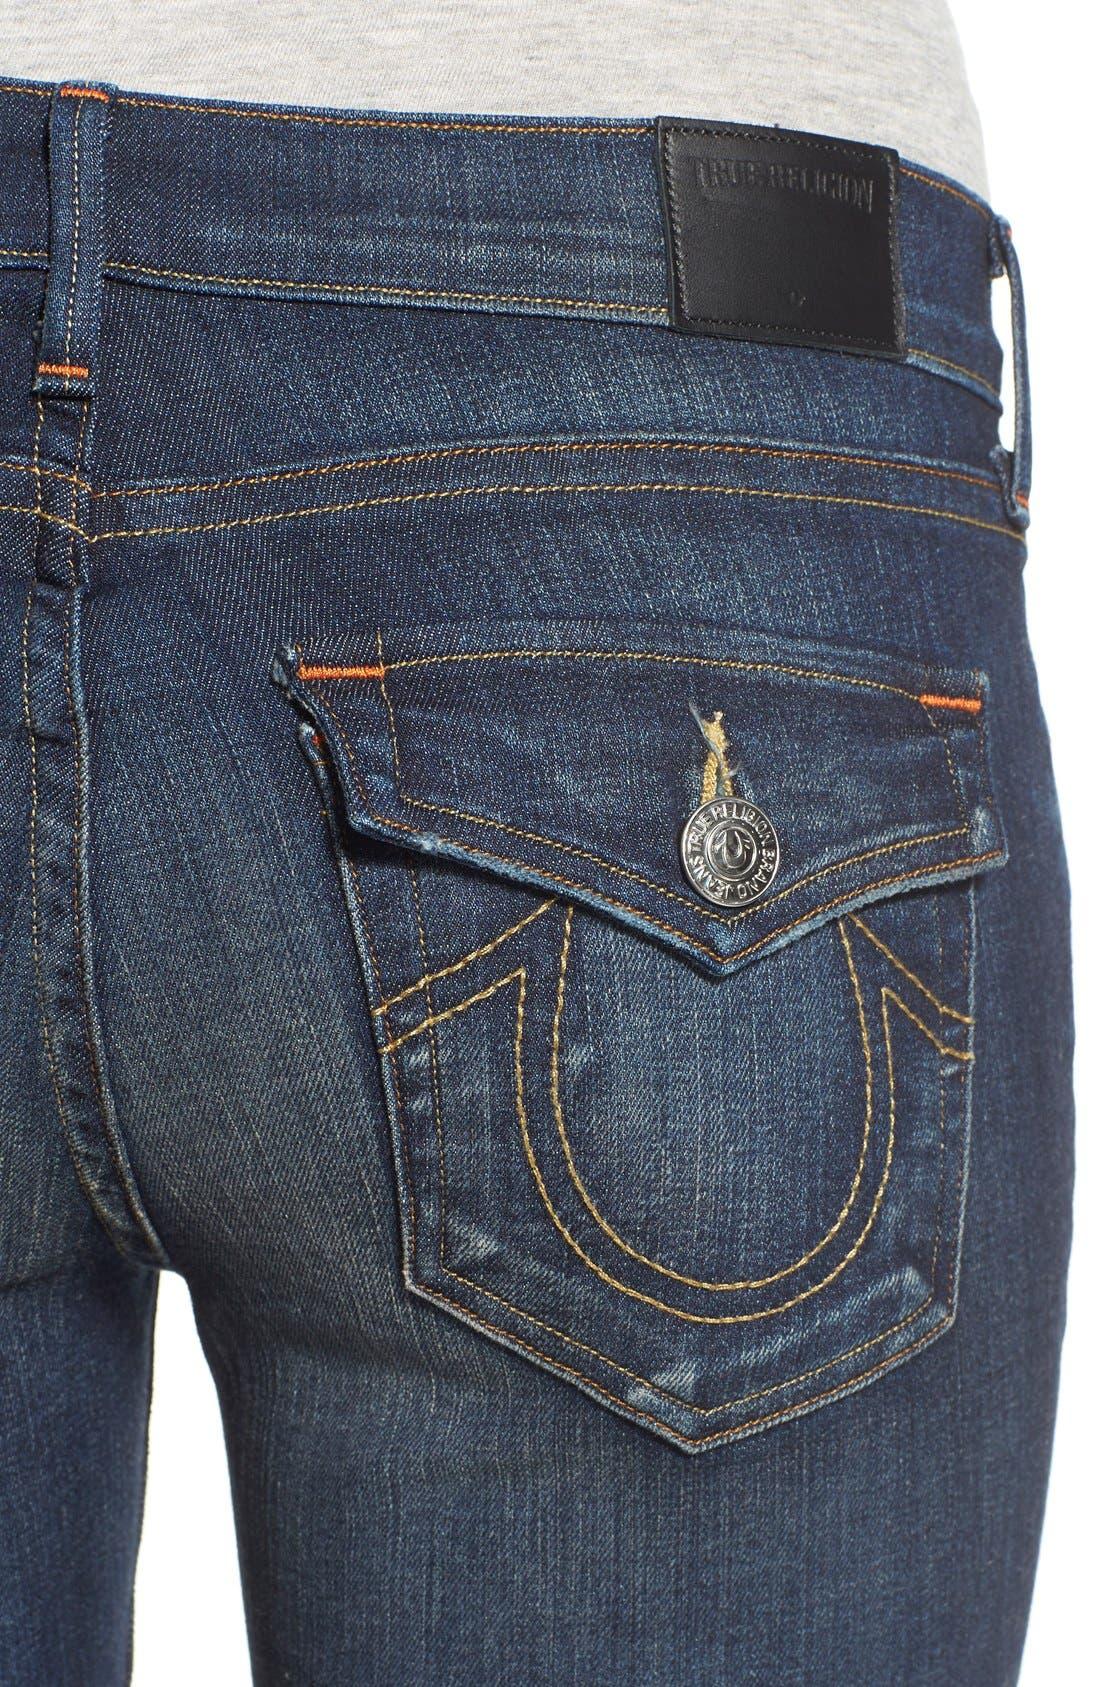 Alternate Image 4  - True Religion Brand Jeans 'Becca' Twisted Seam Bootcut Jeans (Boyfriend Wash)